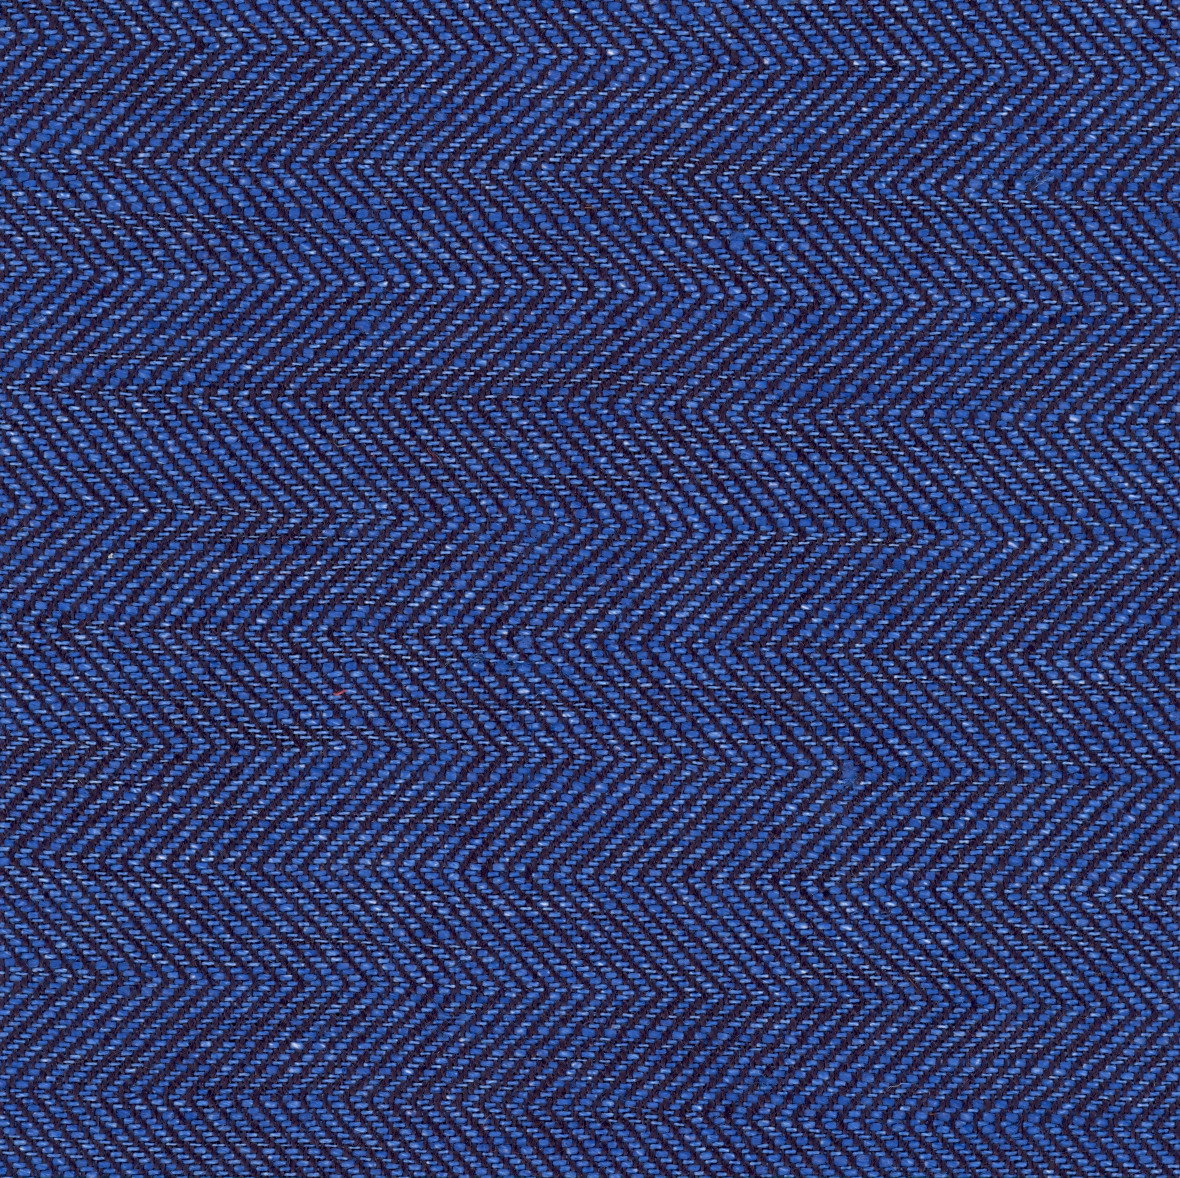 CERRO SPINA PESCE Blue/Dark Blue